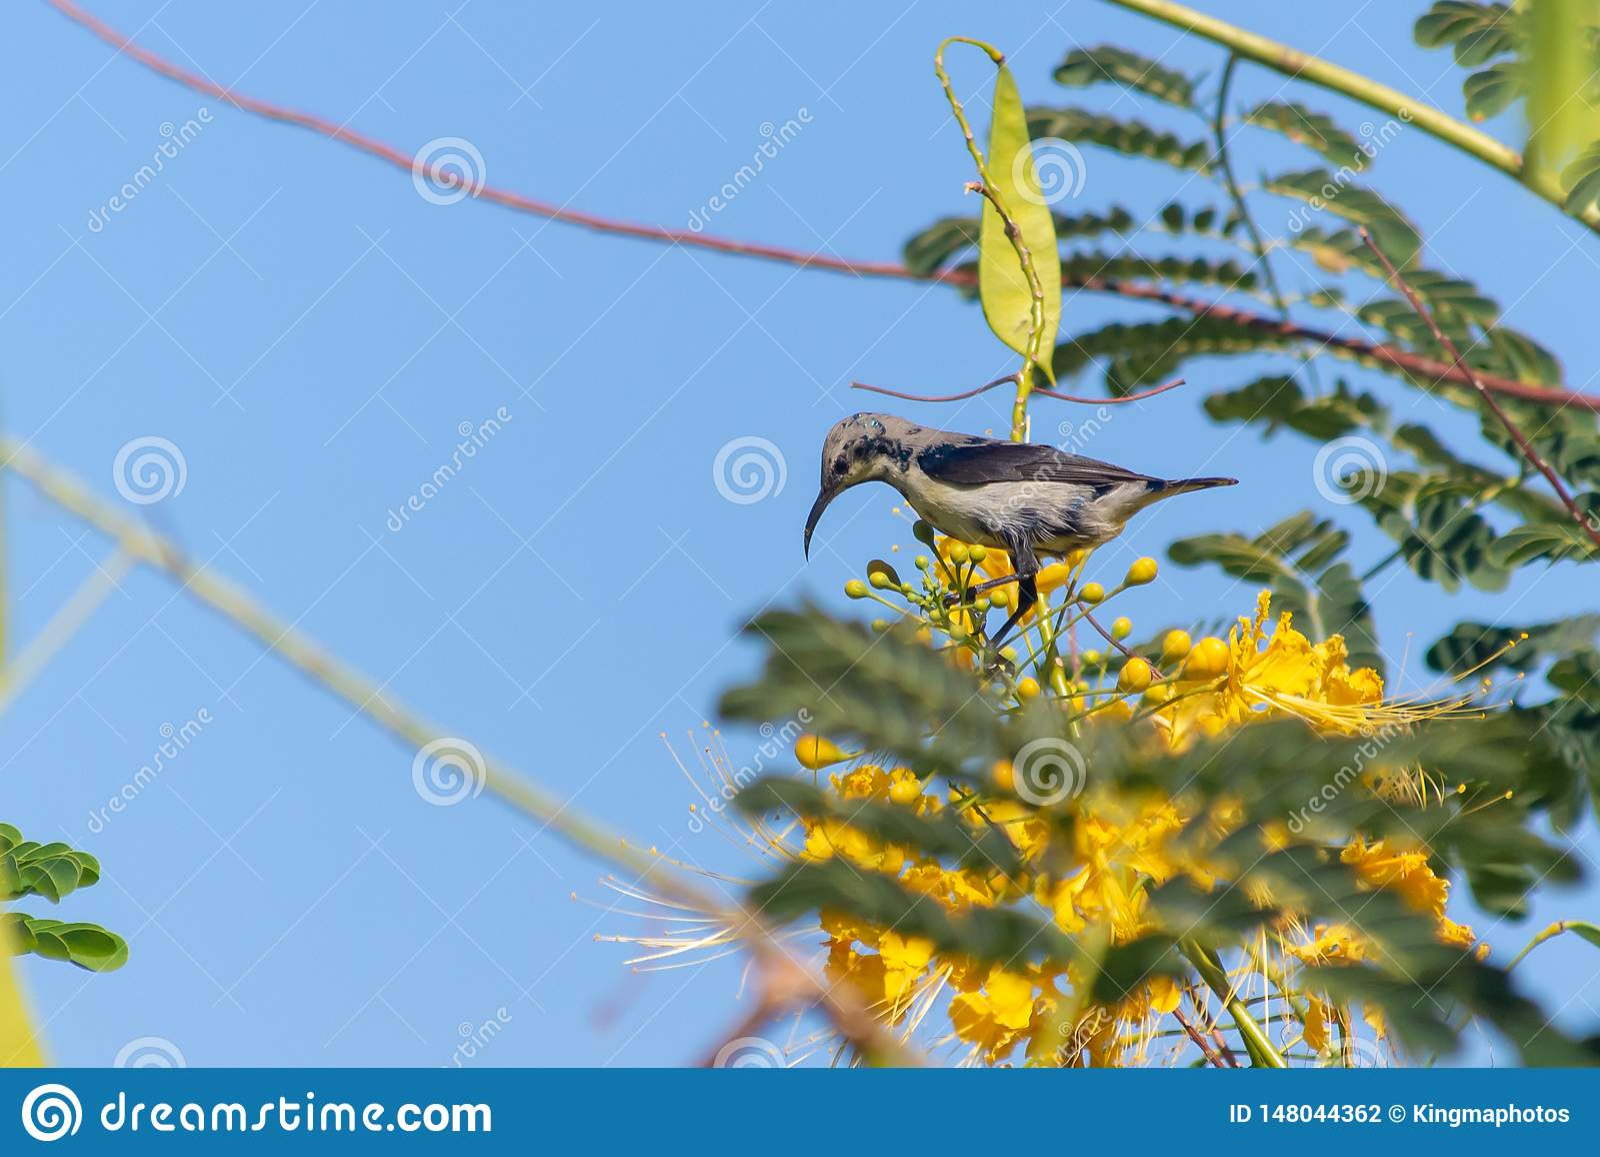 A female Purple Sunbird sucks nectar from a beautiful yellow flower in Muscat, Oman